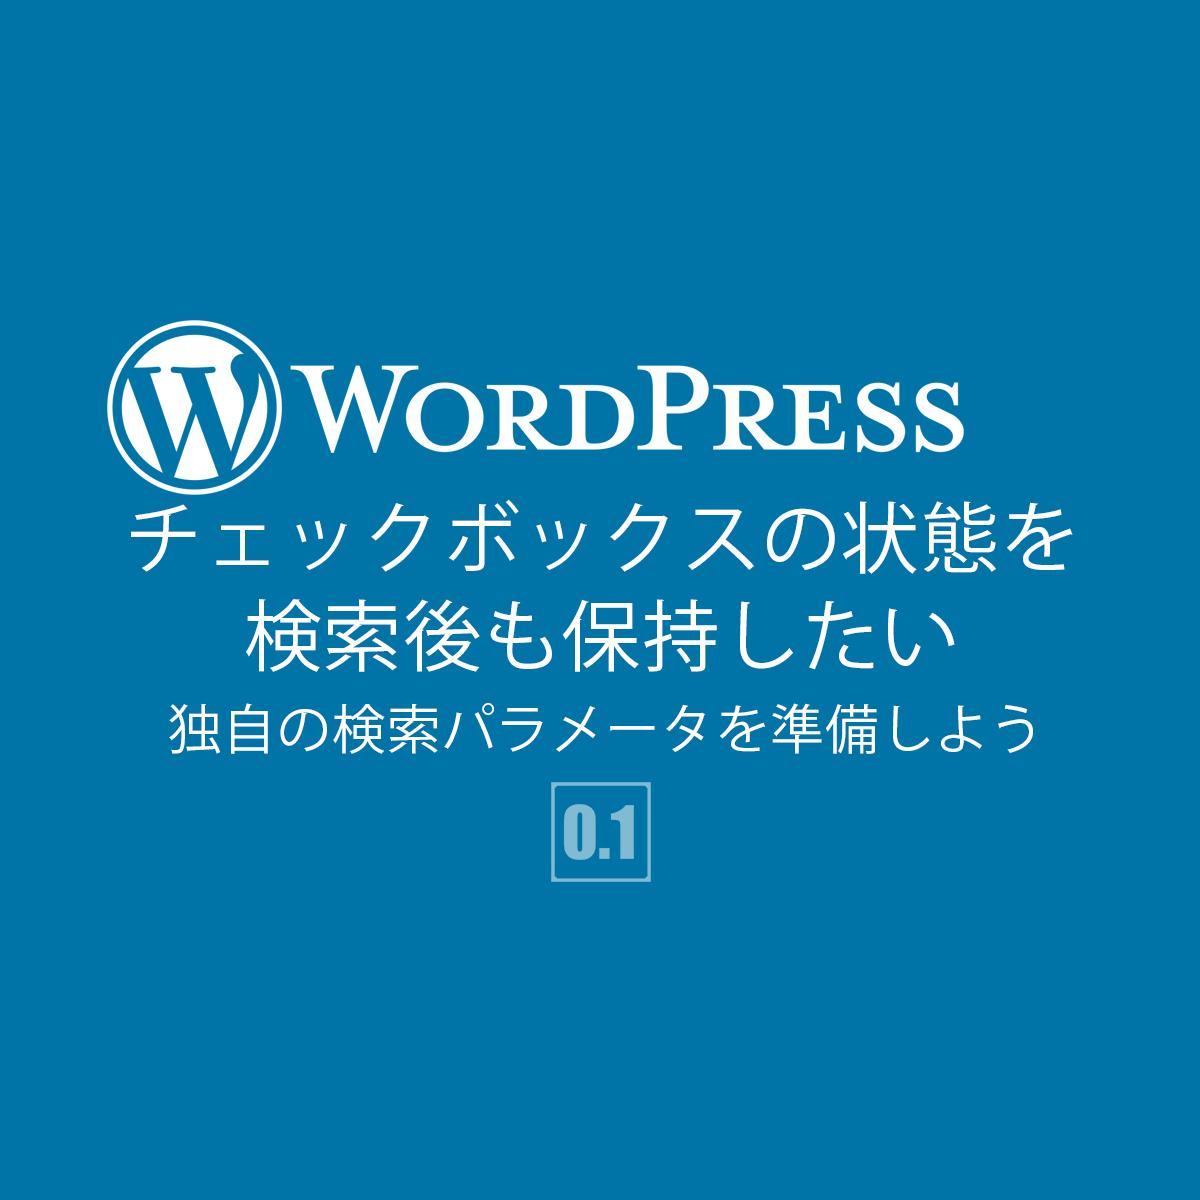 【WordPress】検索後もチェックボックスの状態を保持したい